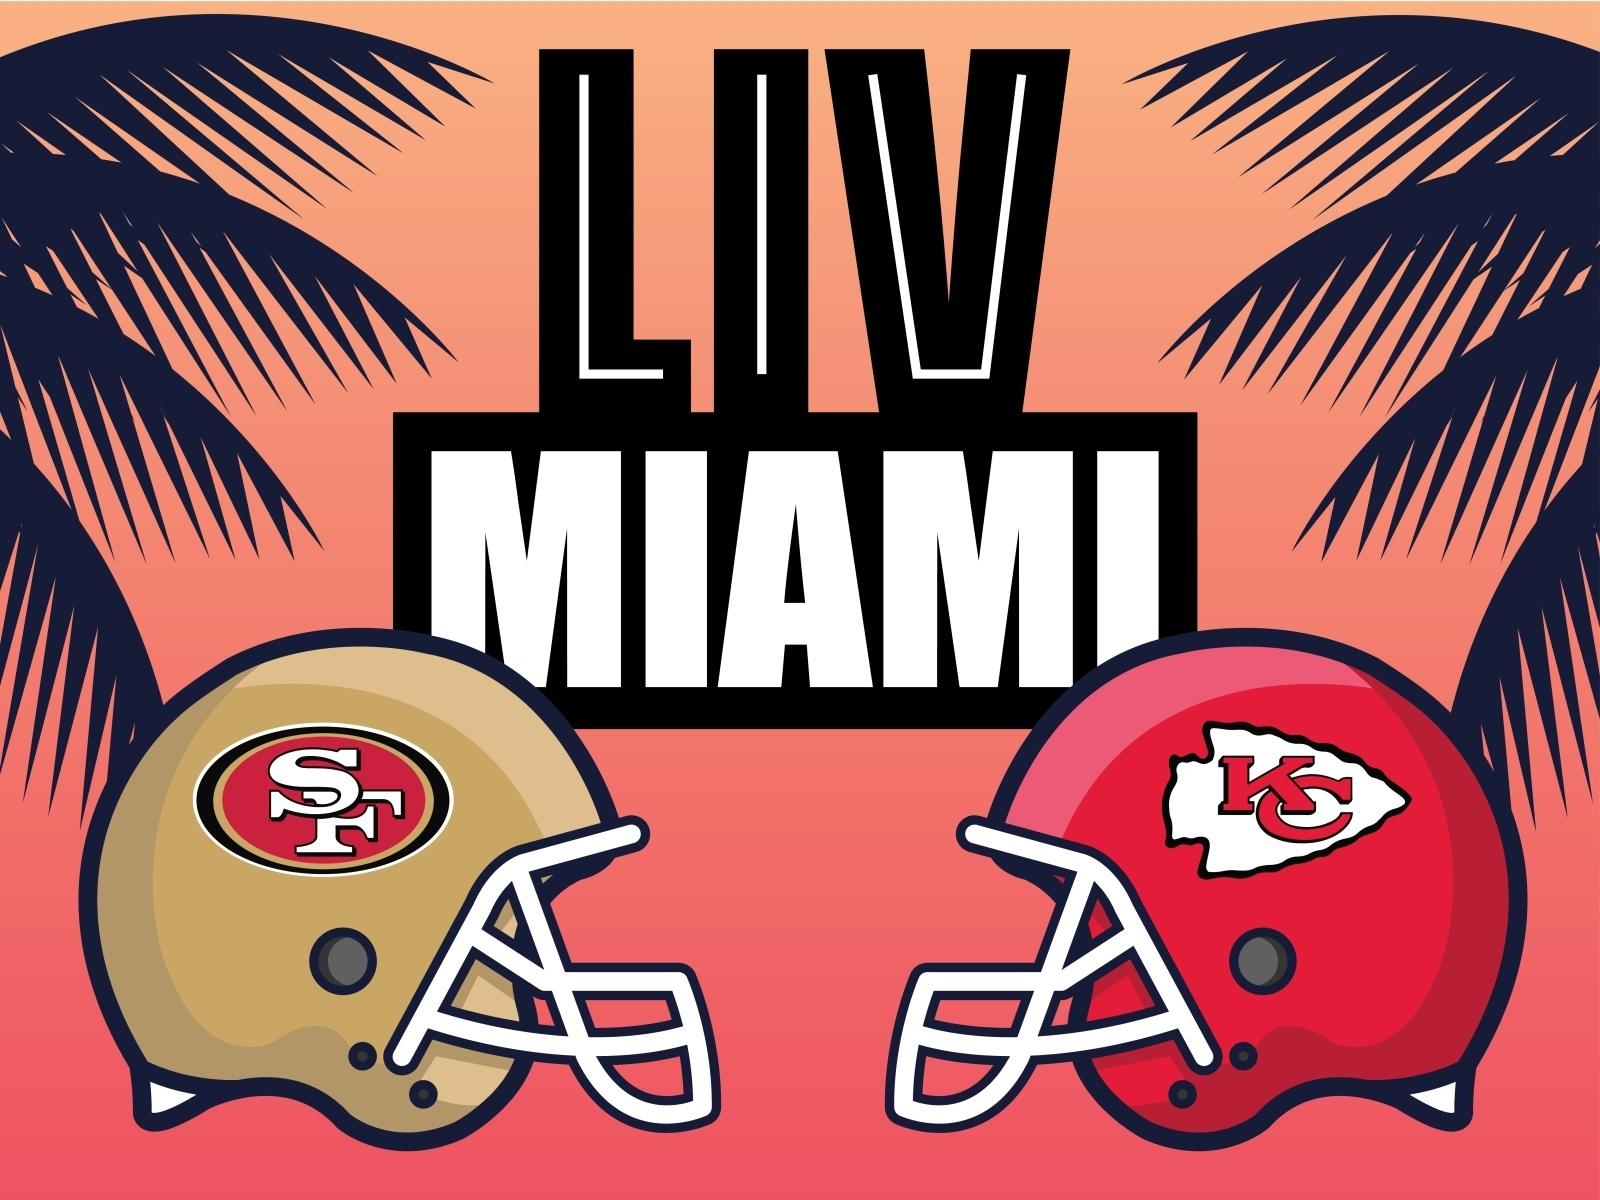 Super Bowl Liv | Miami | Sf 49Ers Vs Ks Chiefsroberto pertaining to 49Ers Vs Miami Super Bowl